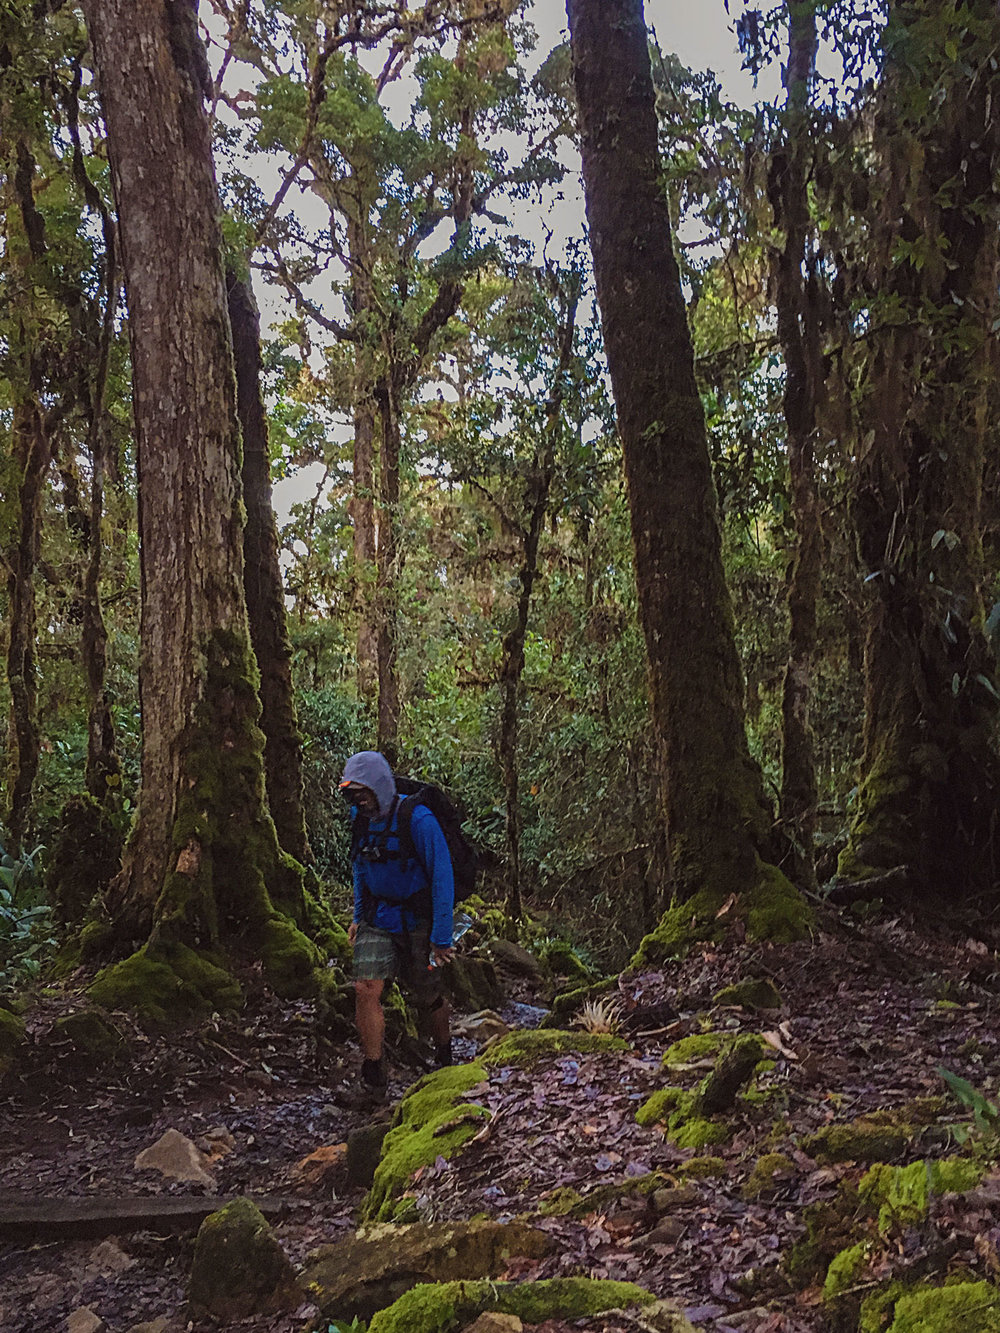 cerro-chiripo-costa-rica-wander-south-8.jpg